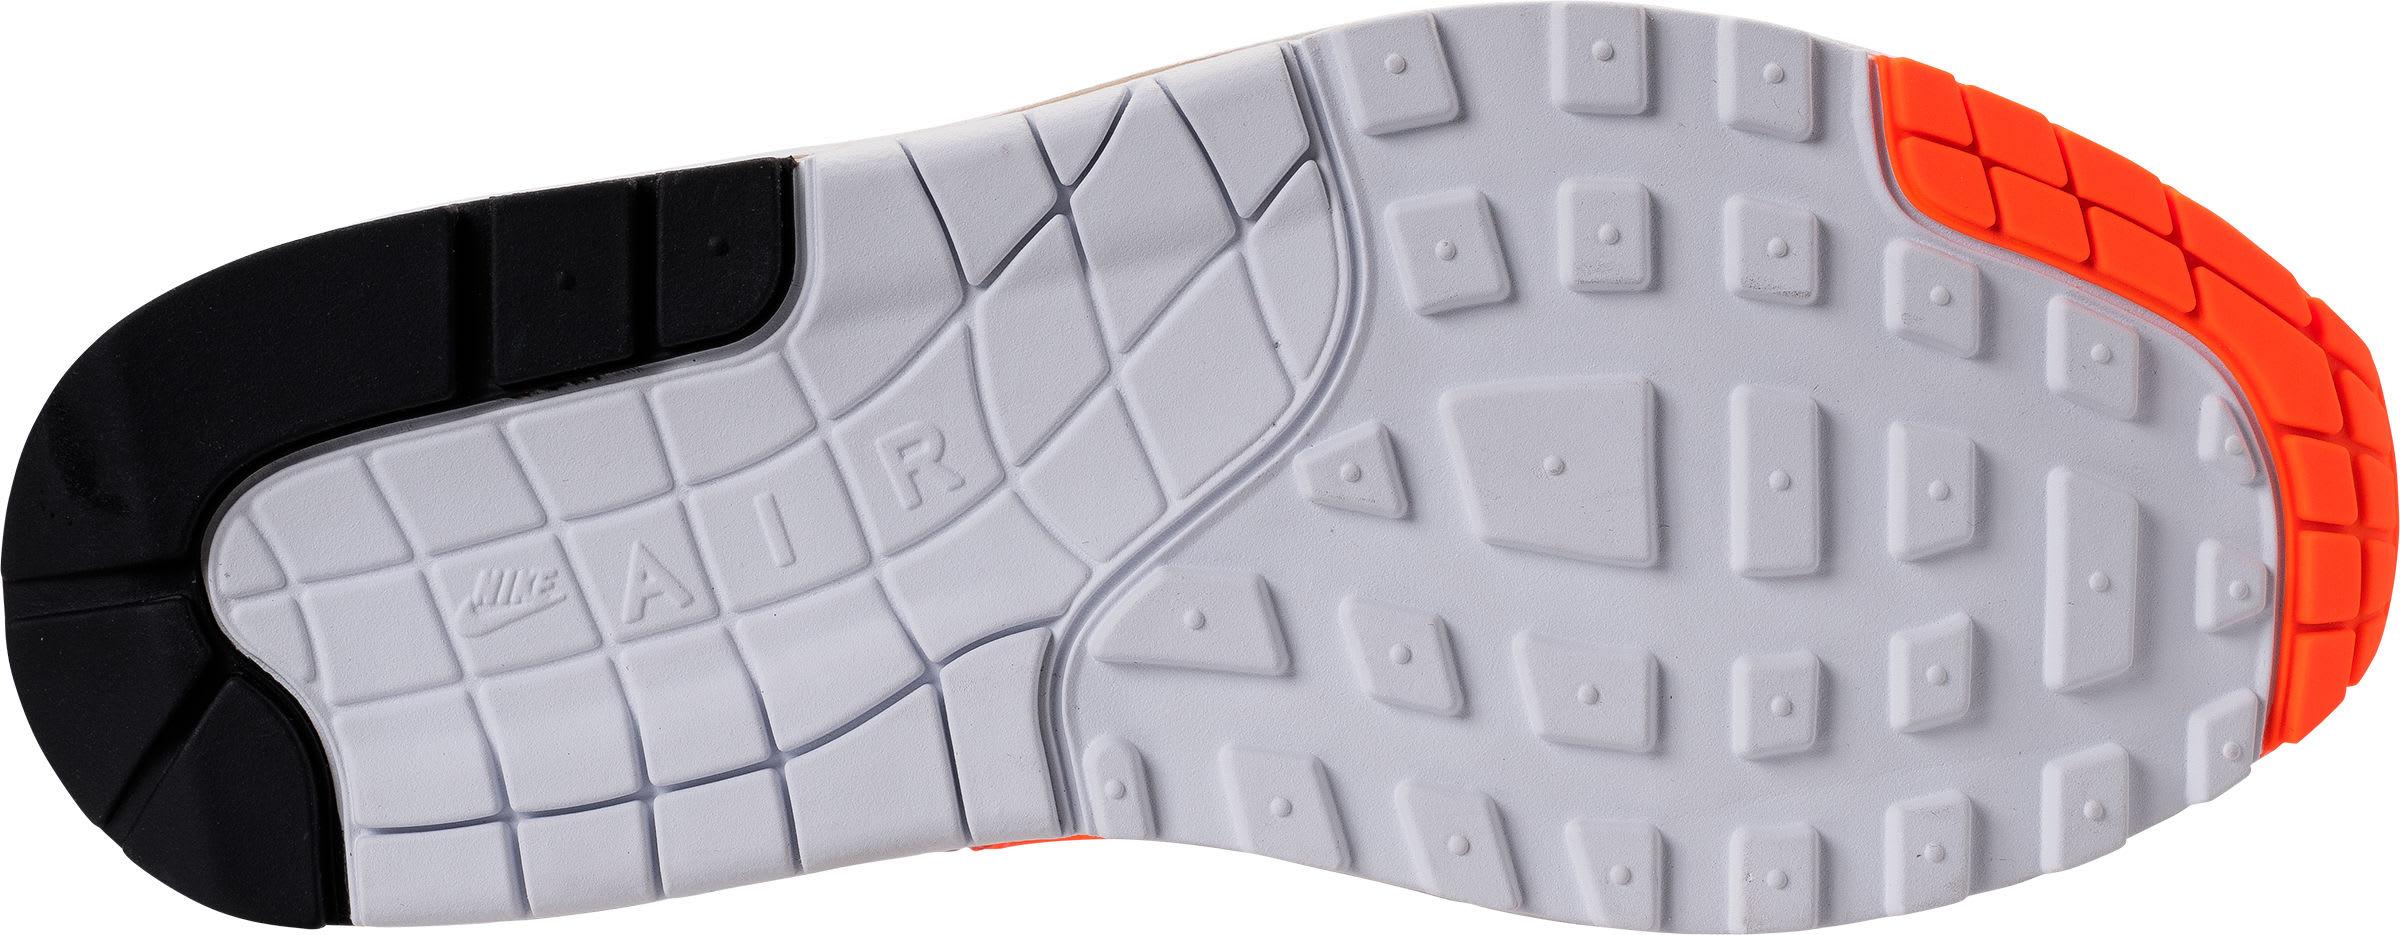 Nike Air Max 1 Just Do It Orange Release Date 917691-800 Sole